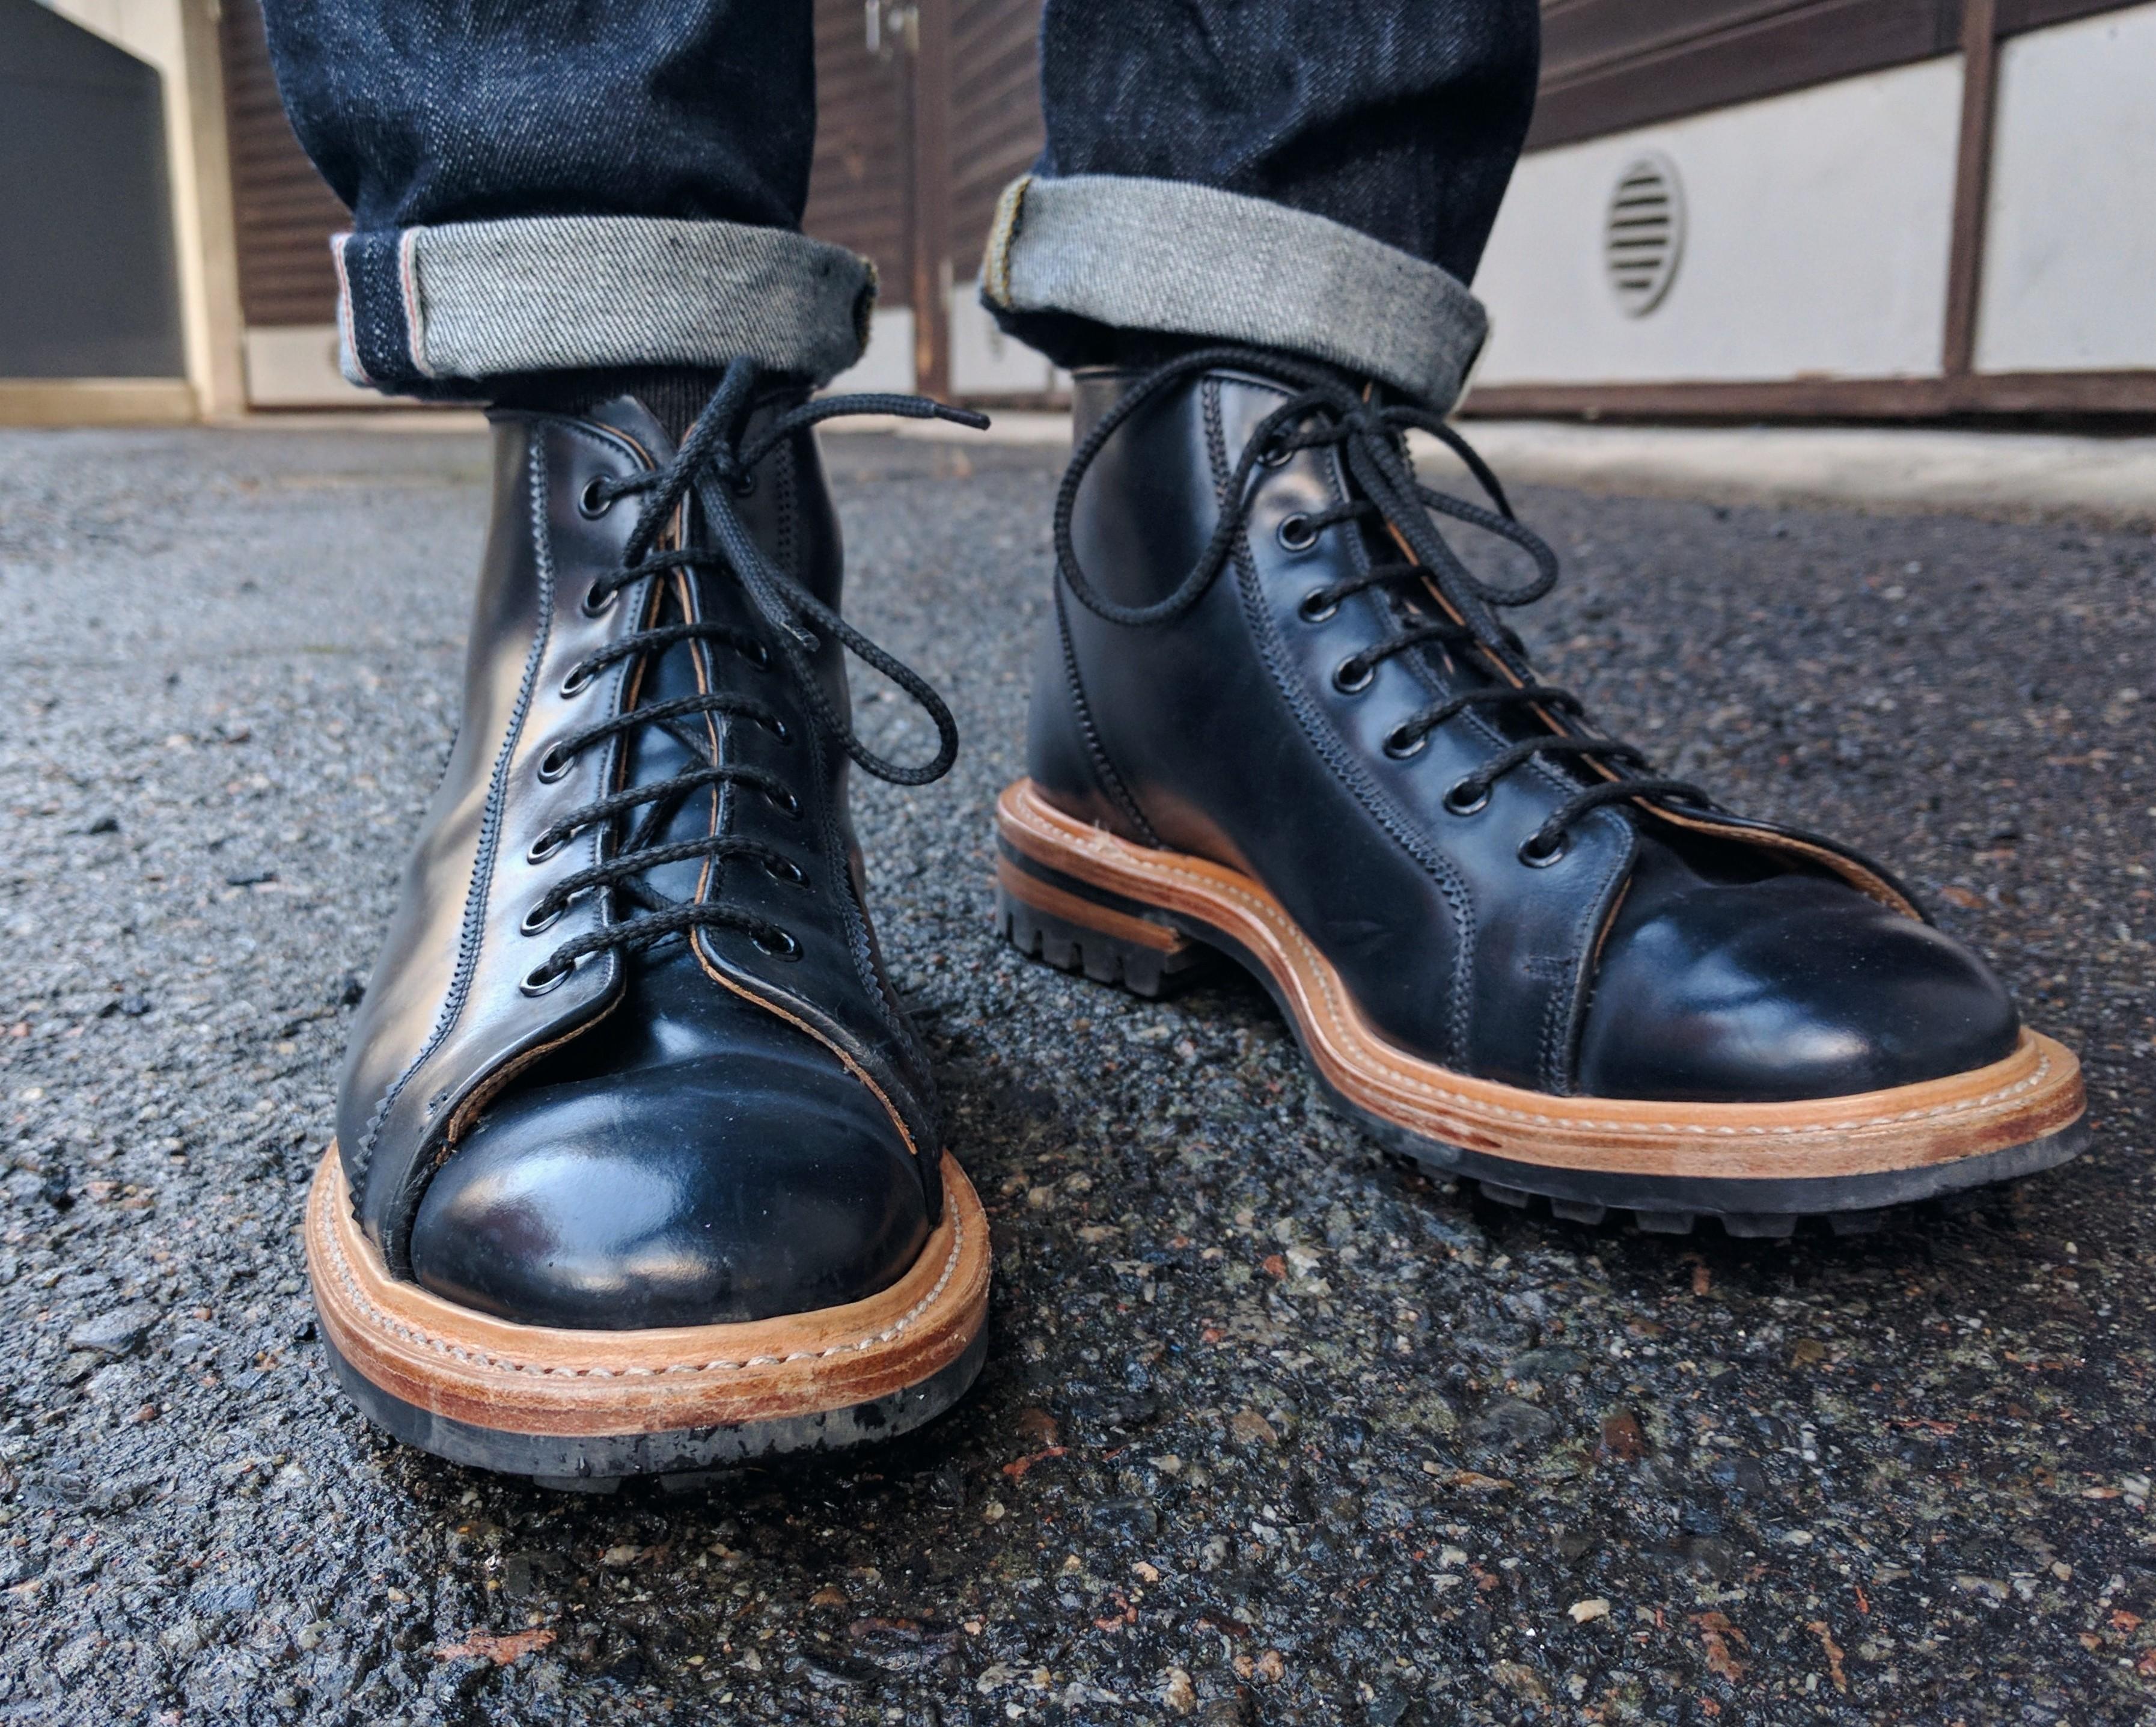 John Elliott Black Trickers Edition Chelsea Boots